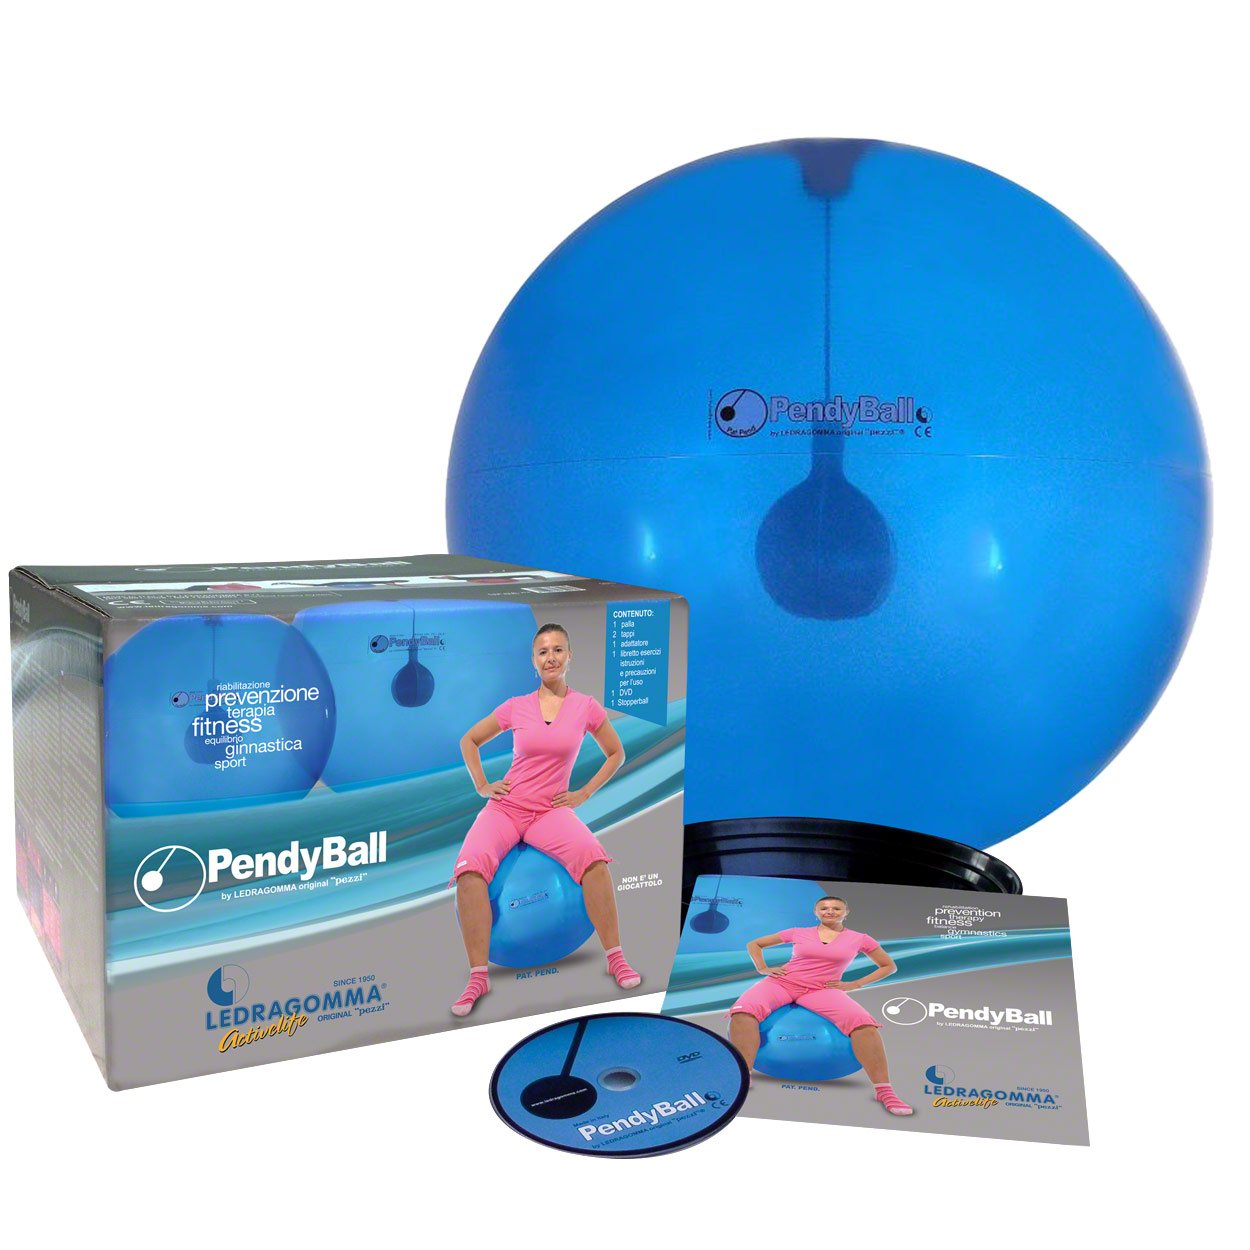 PendyBall by Ledragomma original 'pezzi' / blau-transp. Gymnastikball / Pendel (2 kg) im Inneren Ø 55 cm / Trainingsgerät Reha Rumpfmuskeln günstig online kaufen